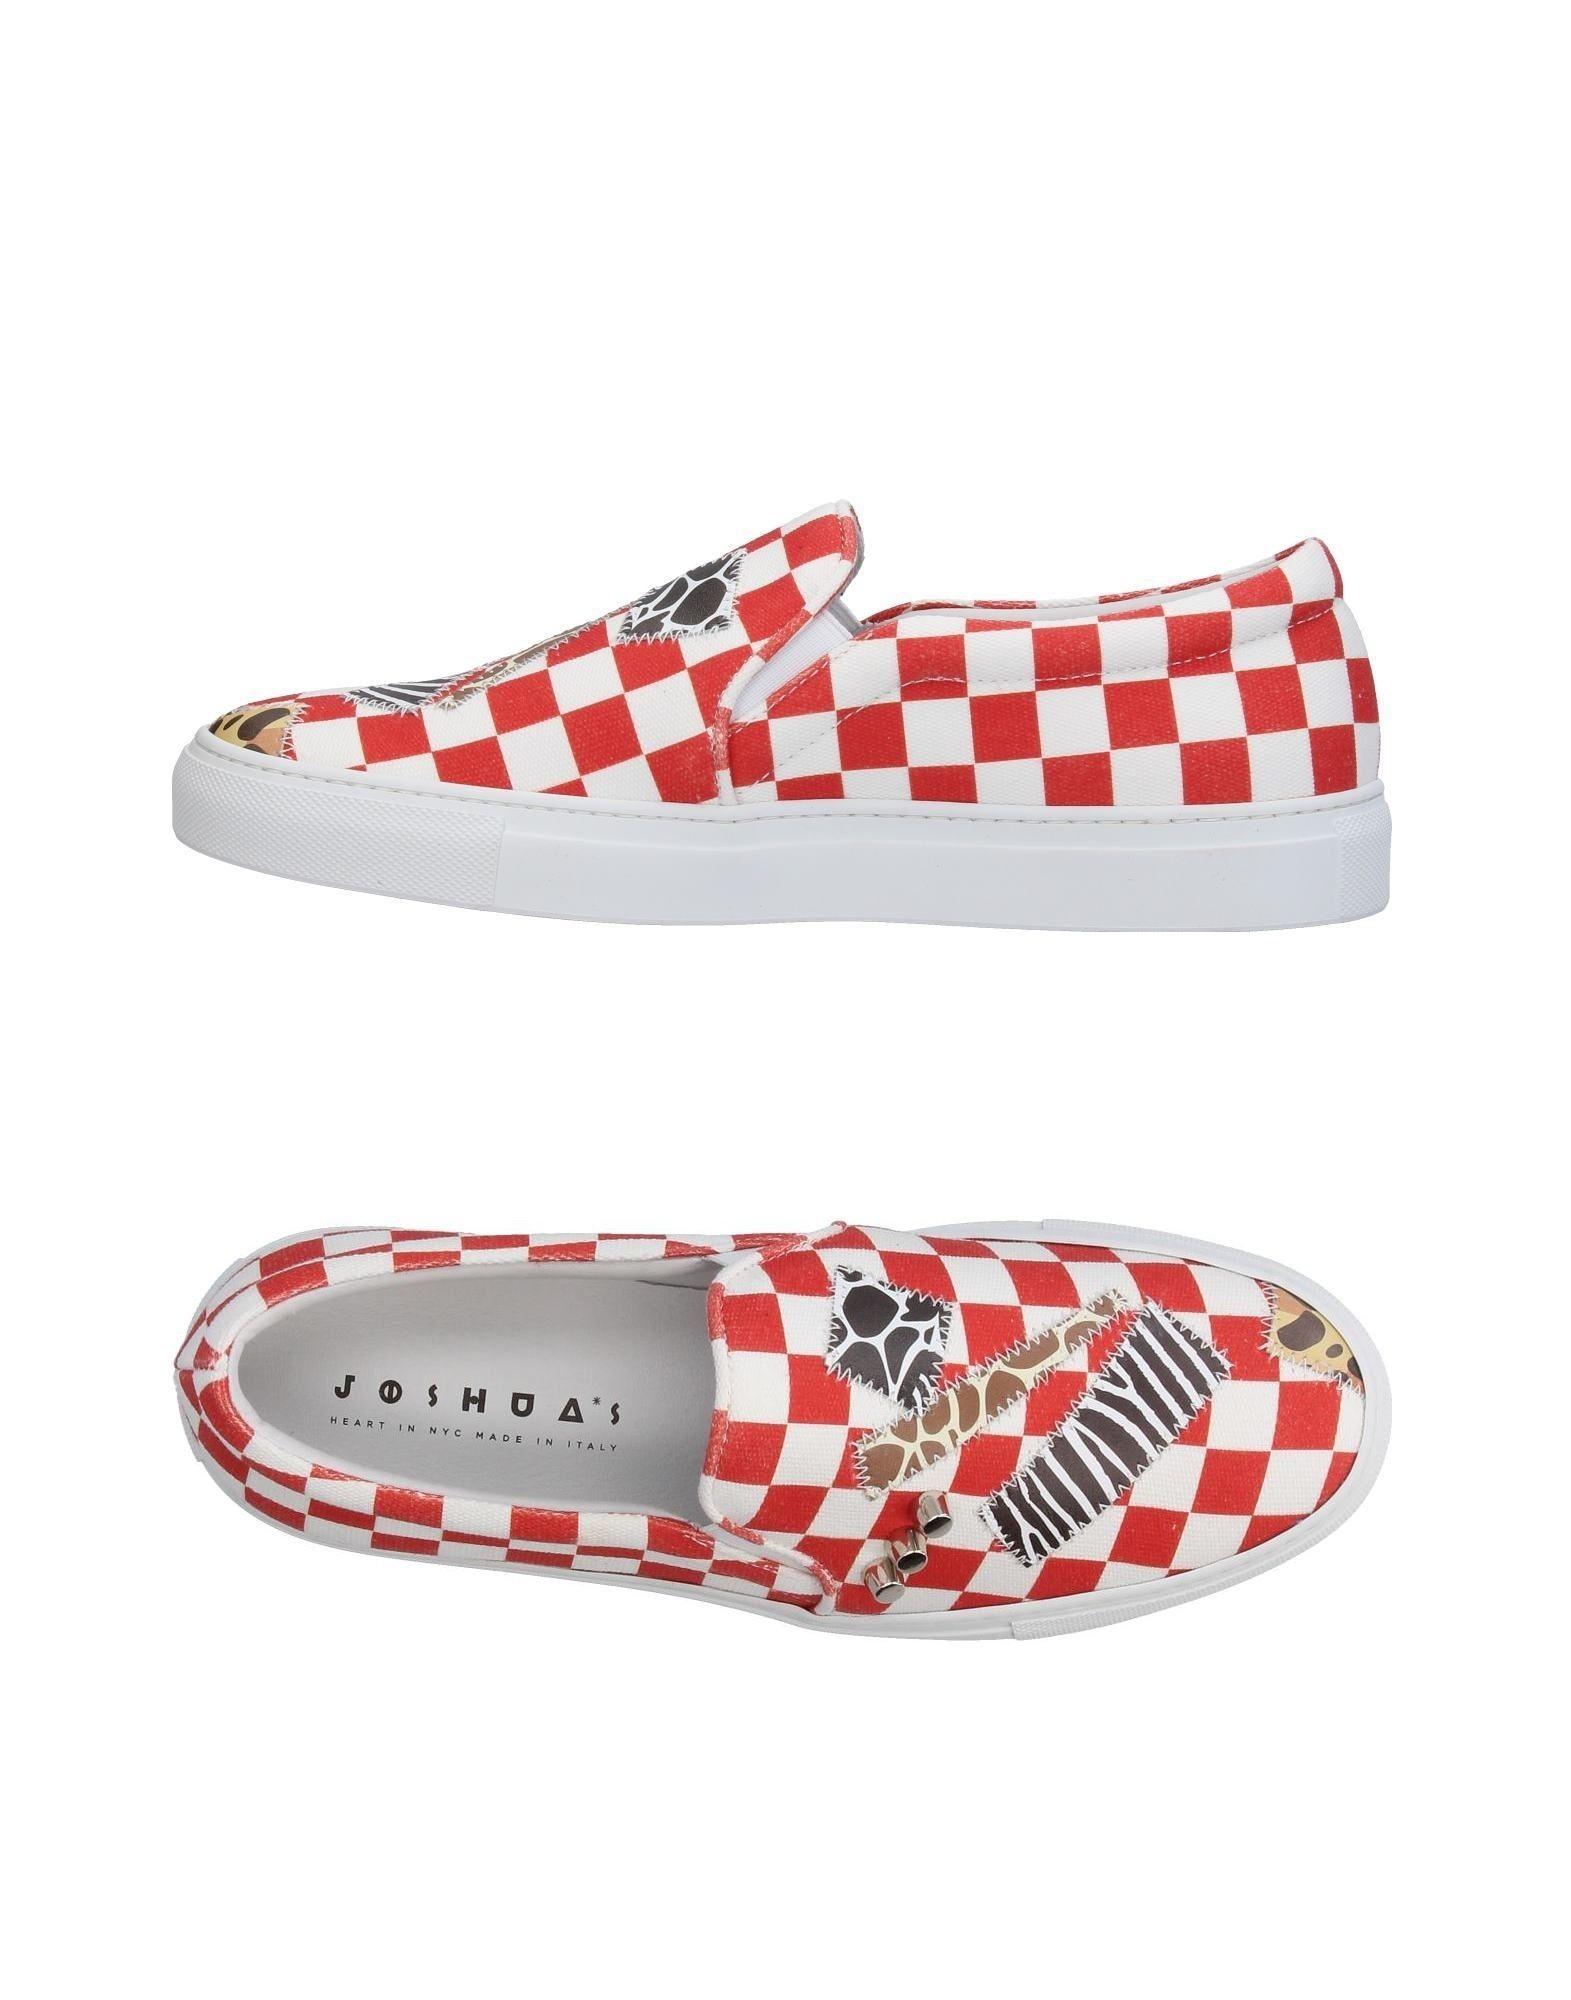 Sneakers Joshua*S Homme - Sneakers Joshua*S sur